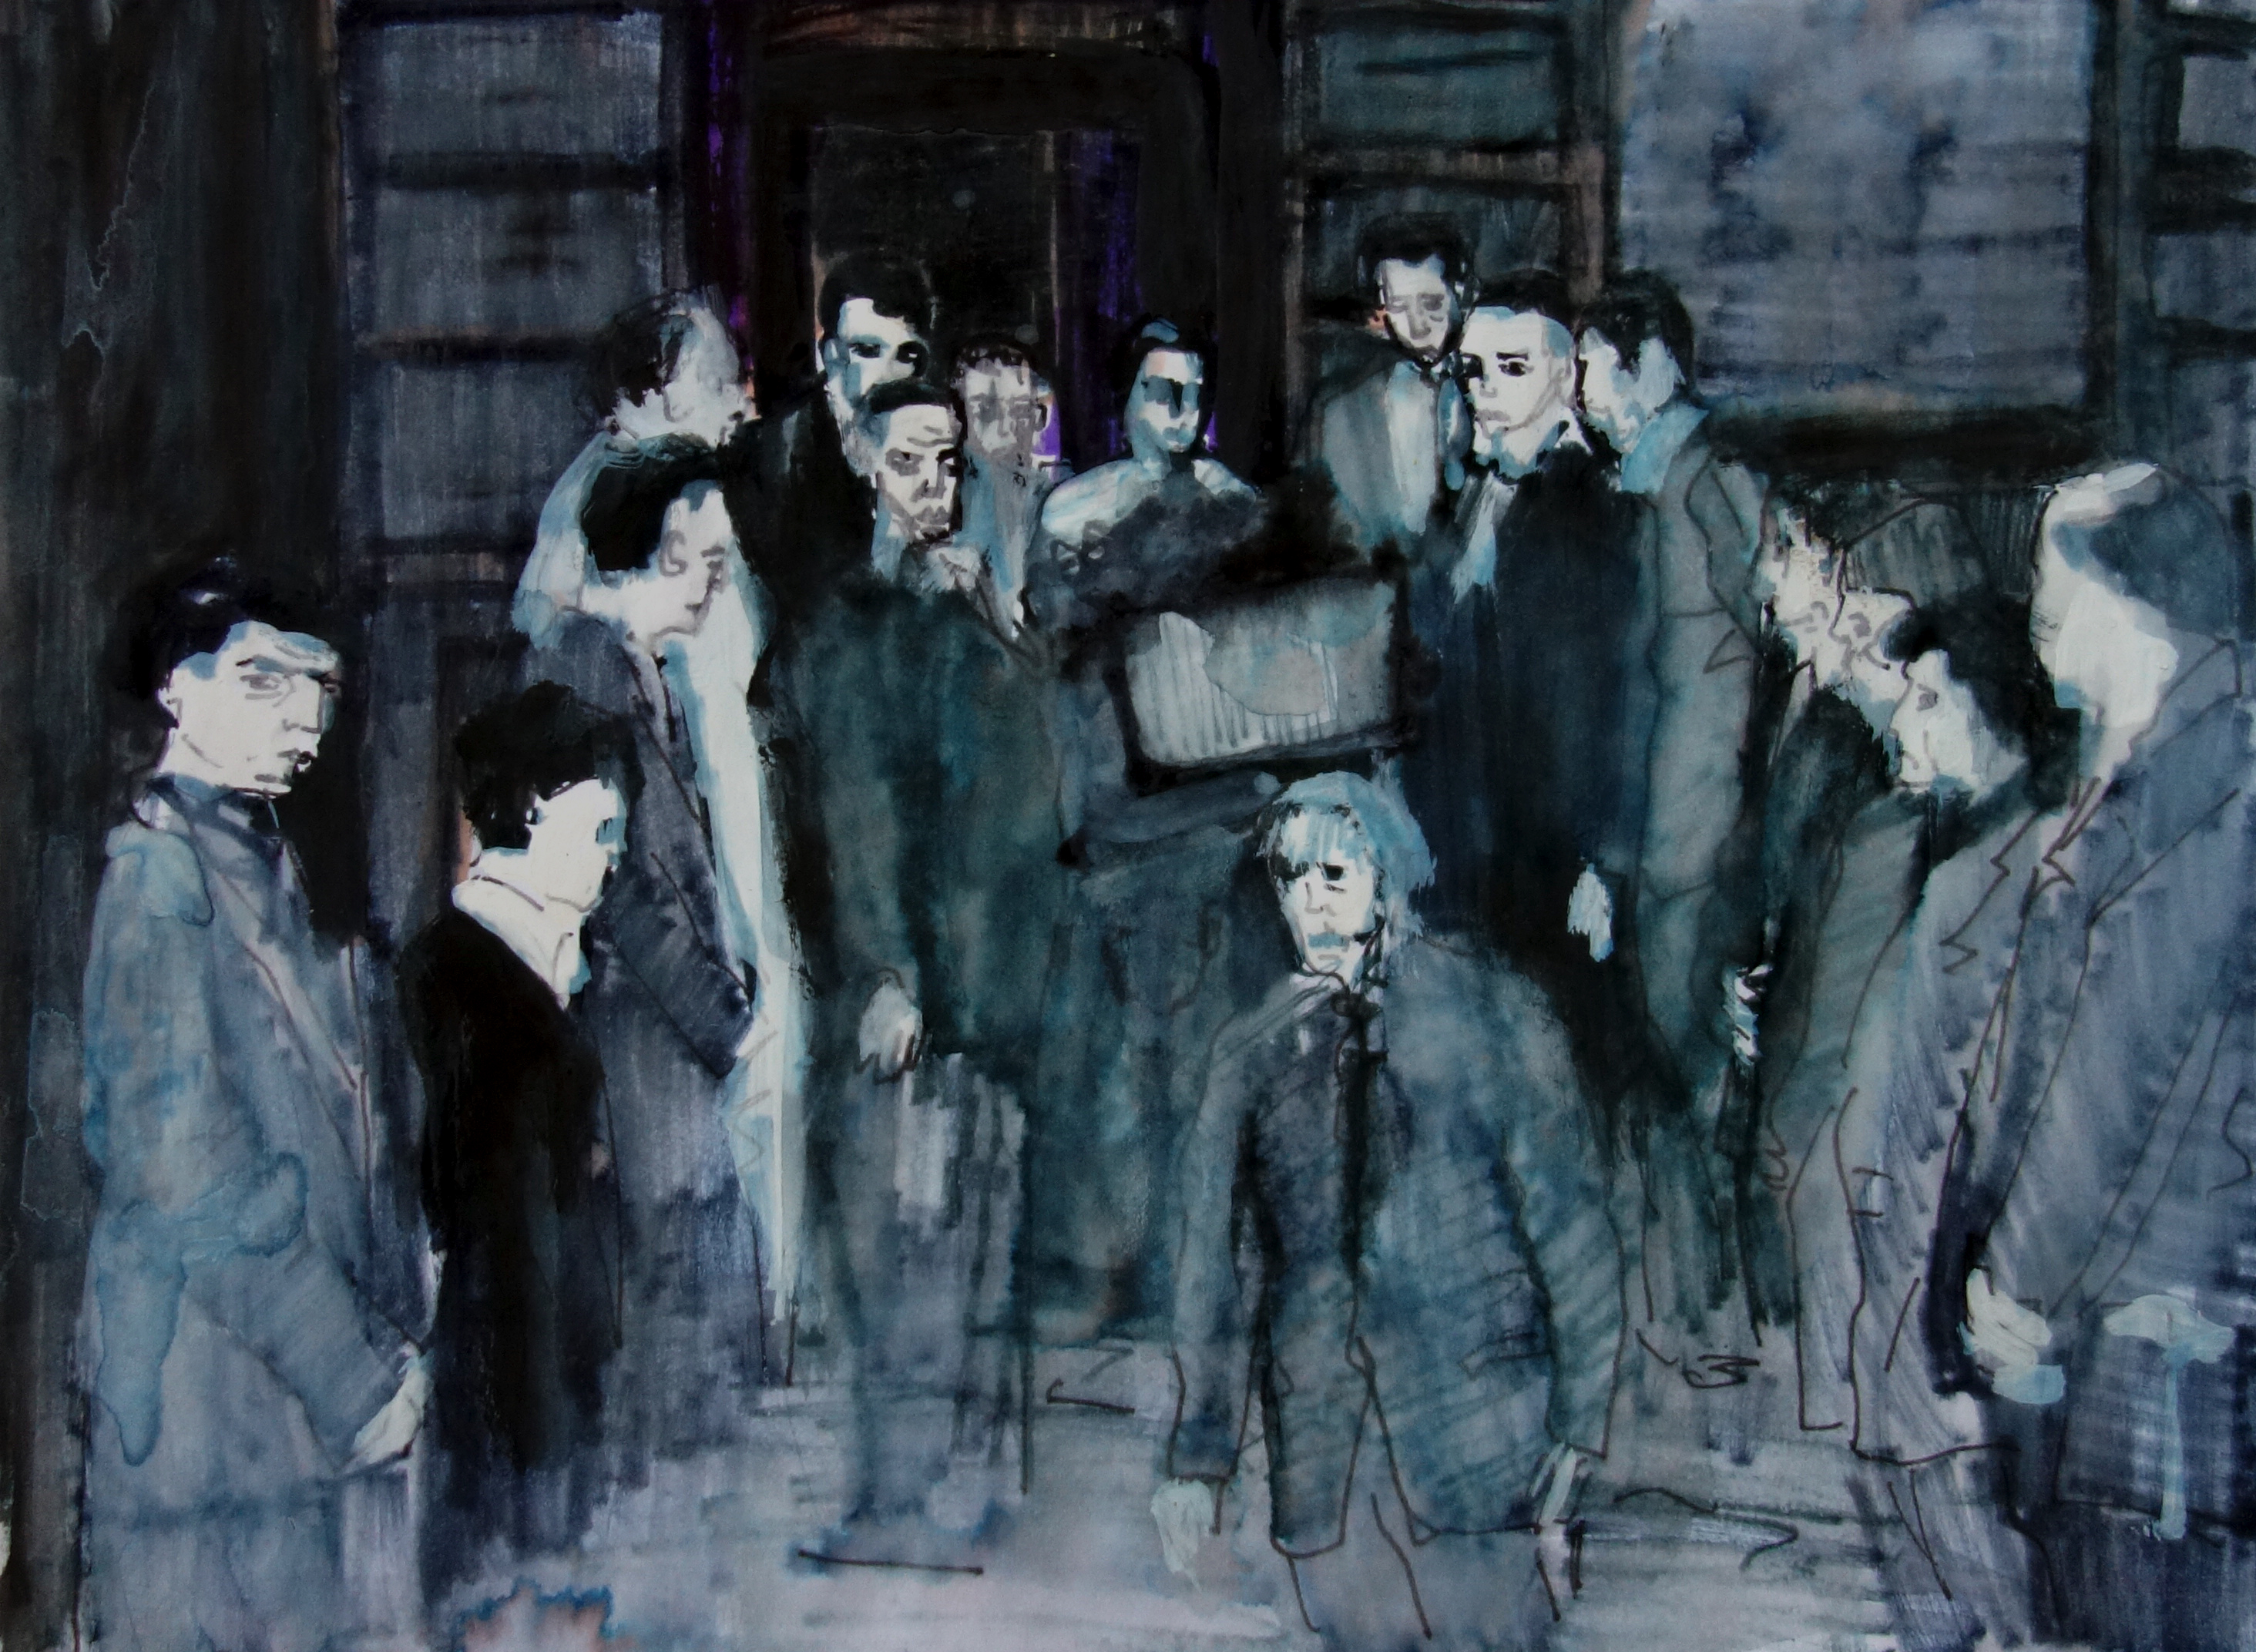 Boy in the box - farewell  - sketch